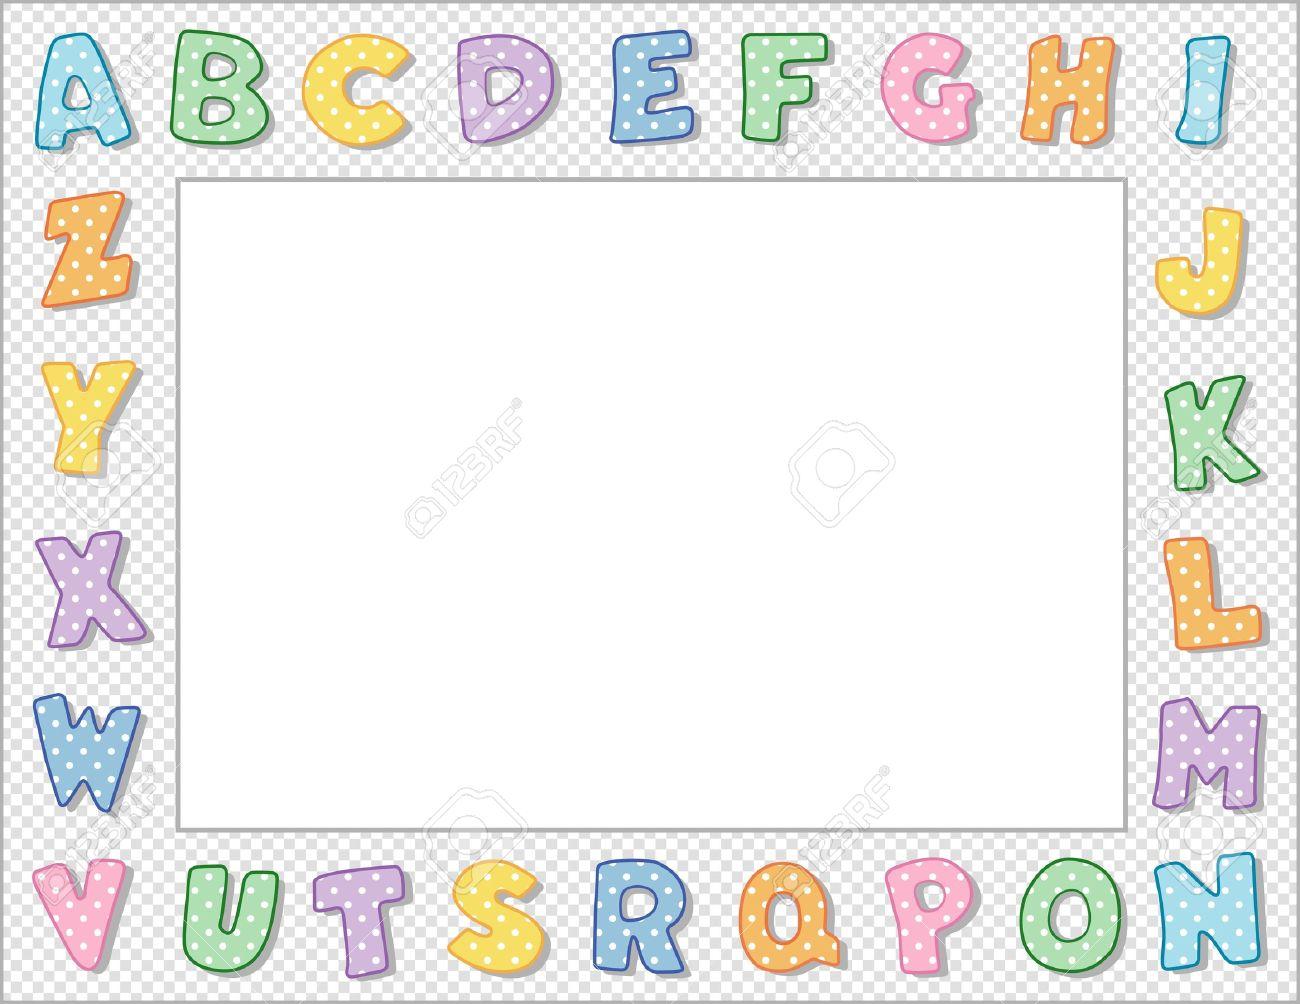 Pastel Polka Dot Alphabet Frame with Copy Space Stock Vector - 13285814